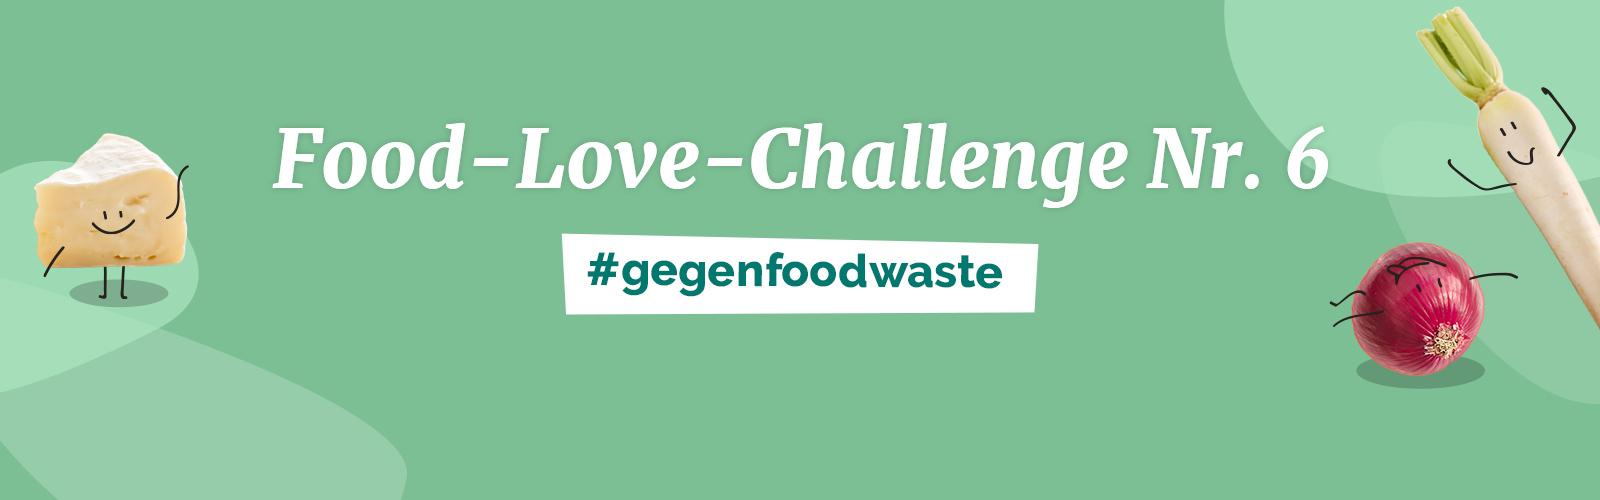 Food Love Challenge Nr. 6